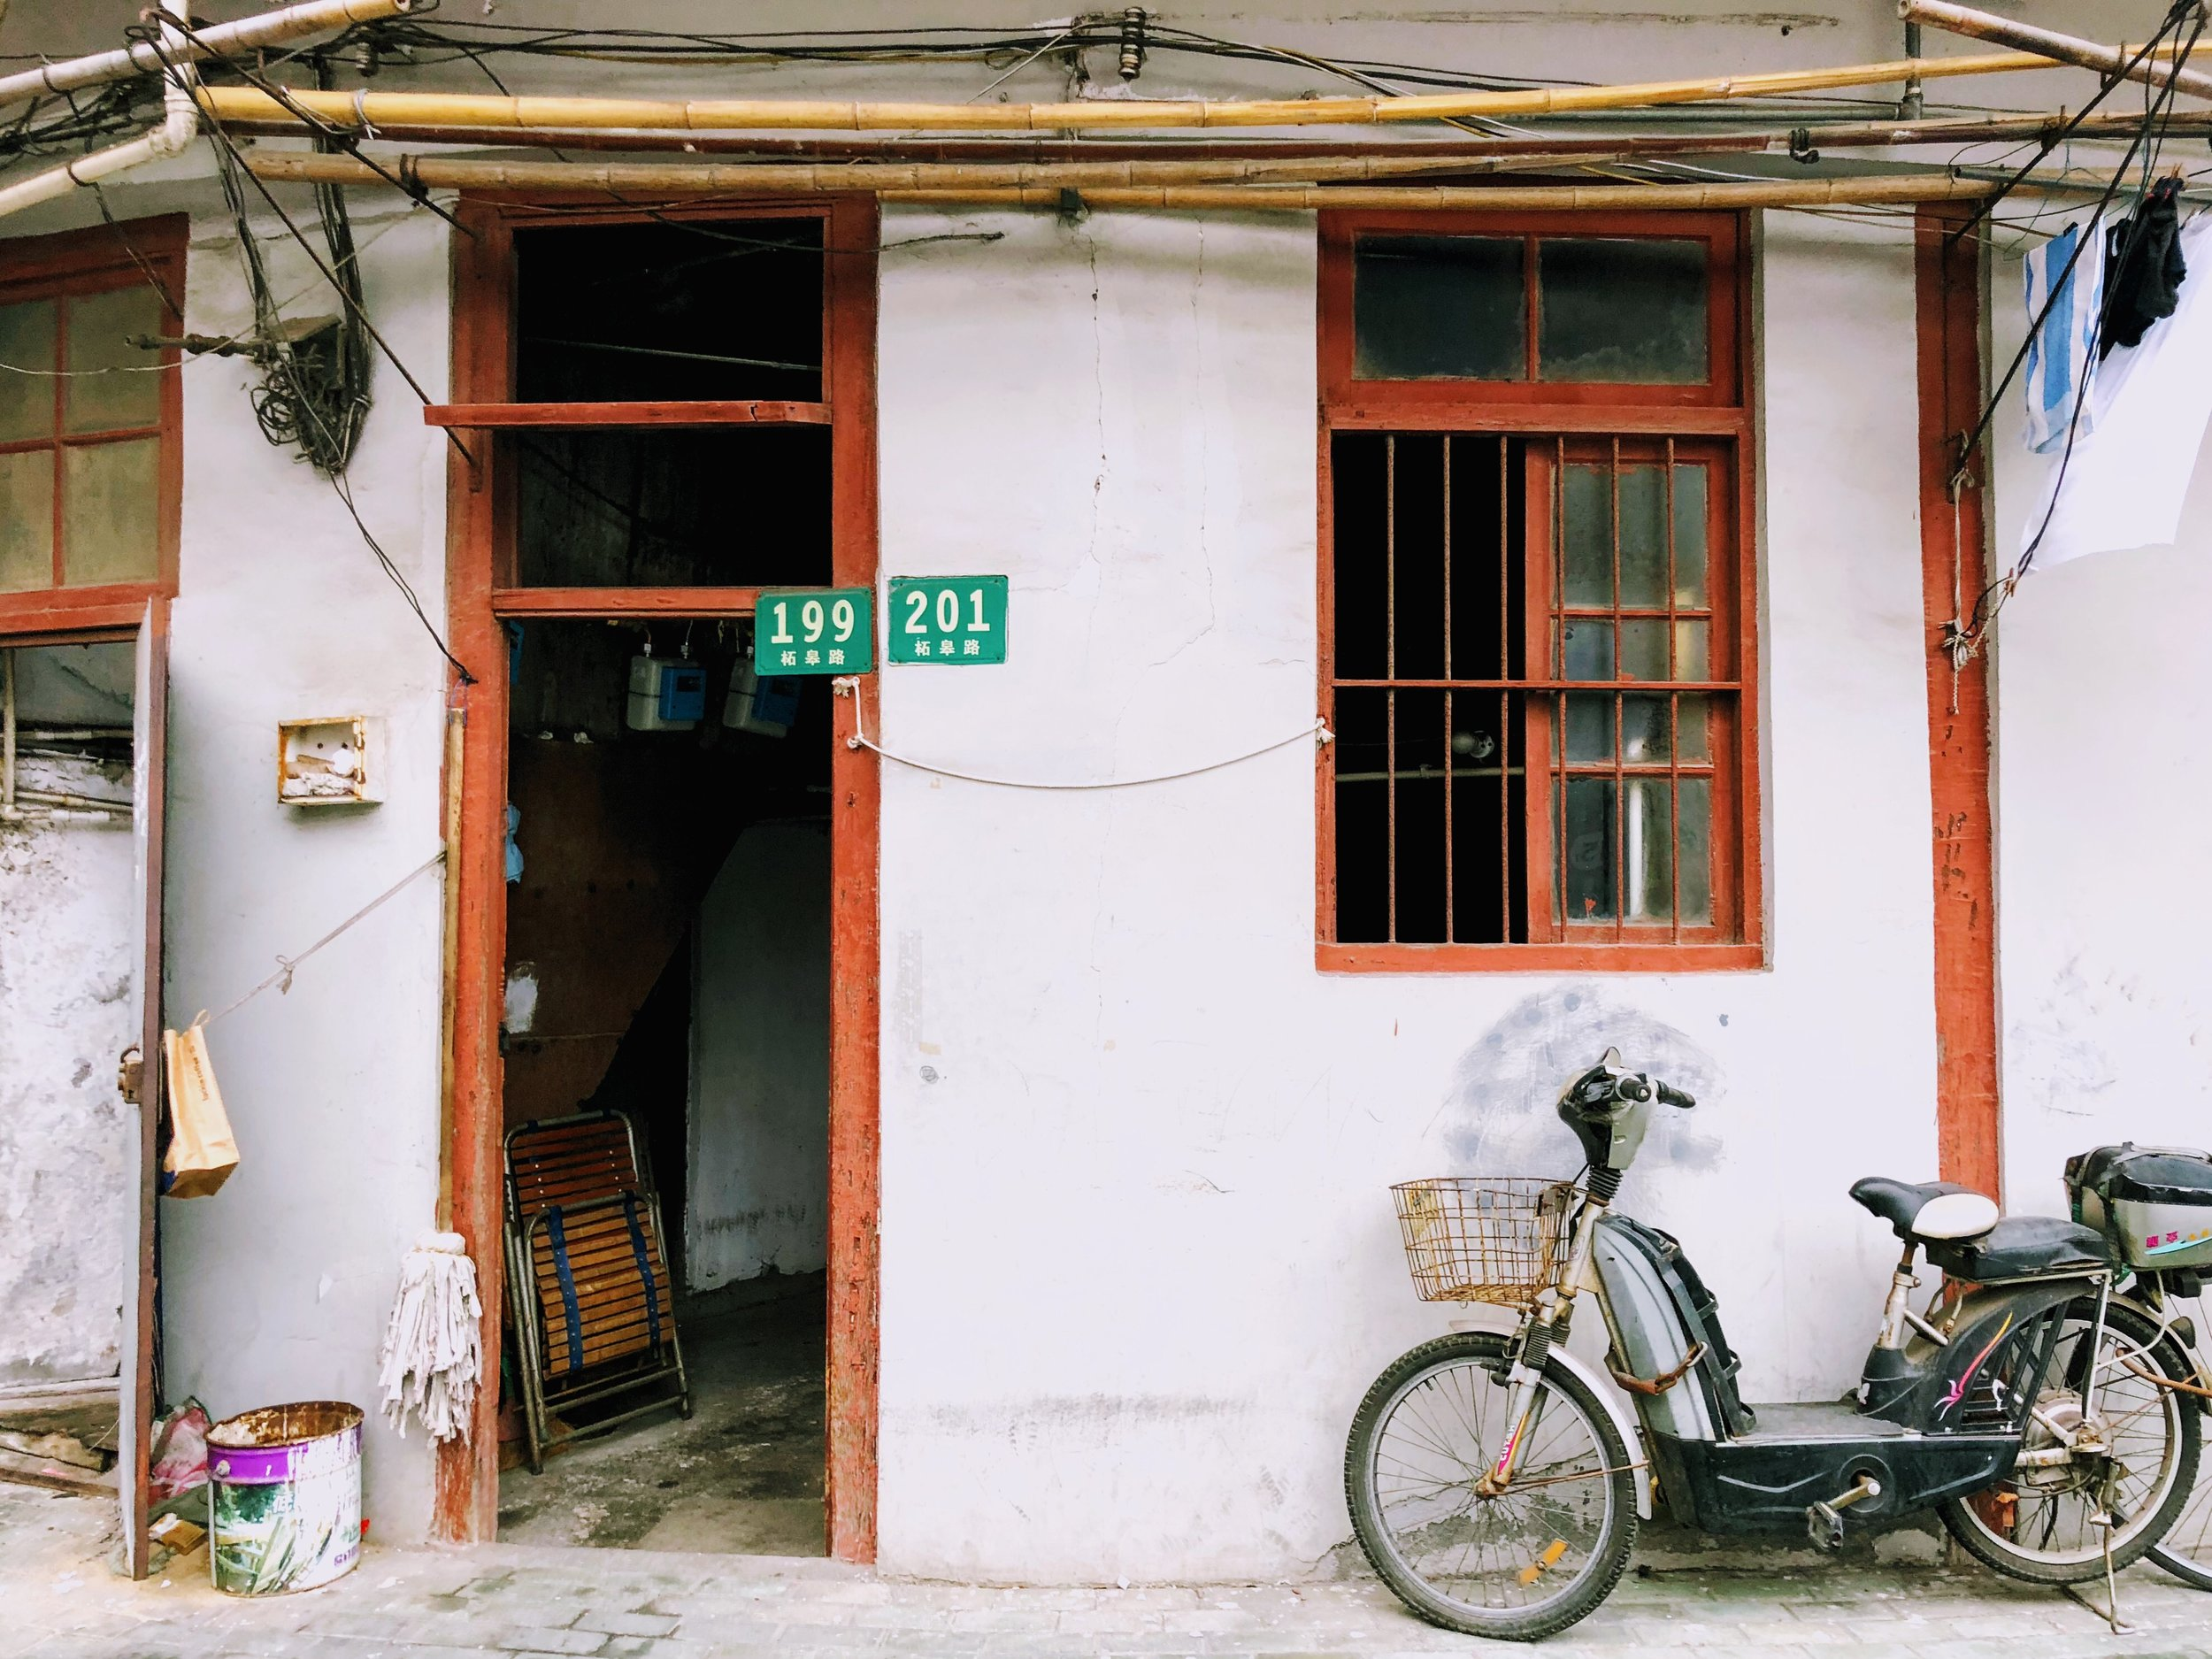 China-Partnership-A-Life-Transformed-By-God-Part-4